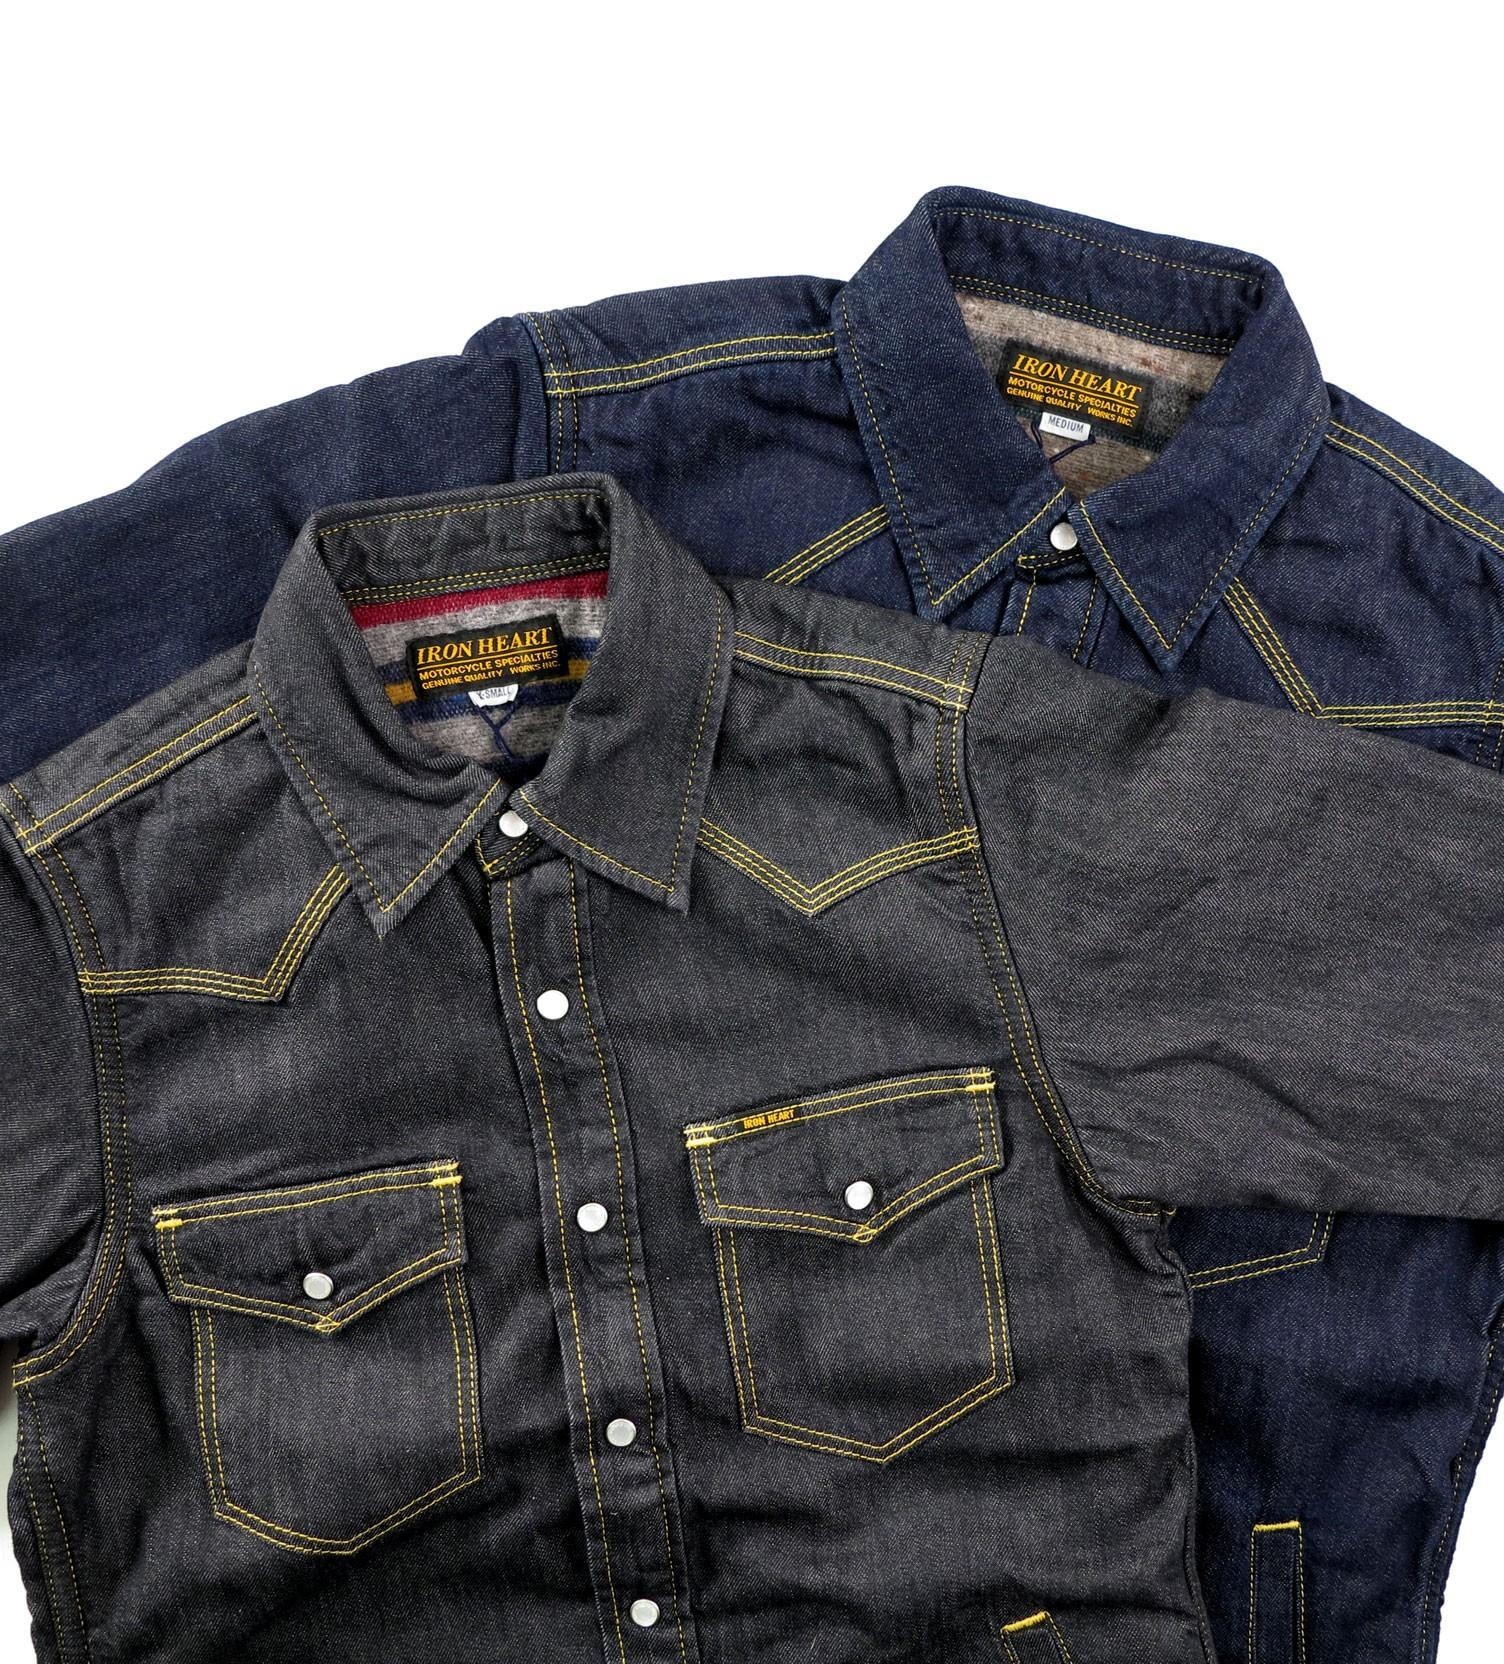 4809f28ea6 Blanket Lined 8oz Indigo or Black Denim Shirt